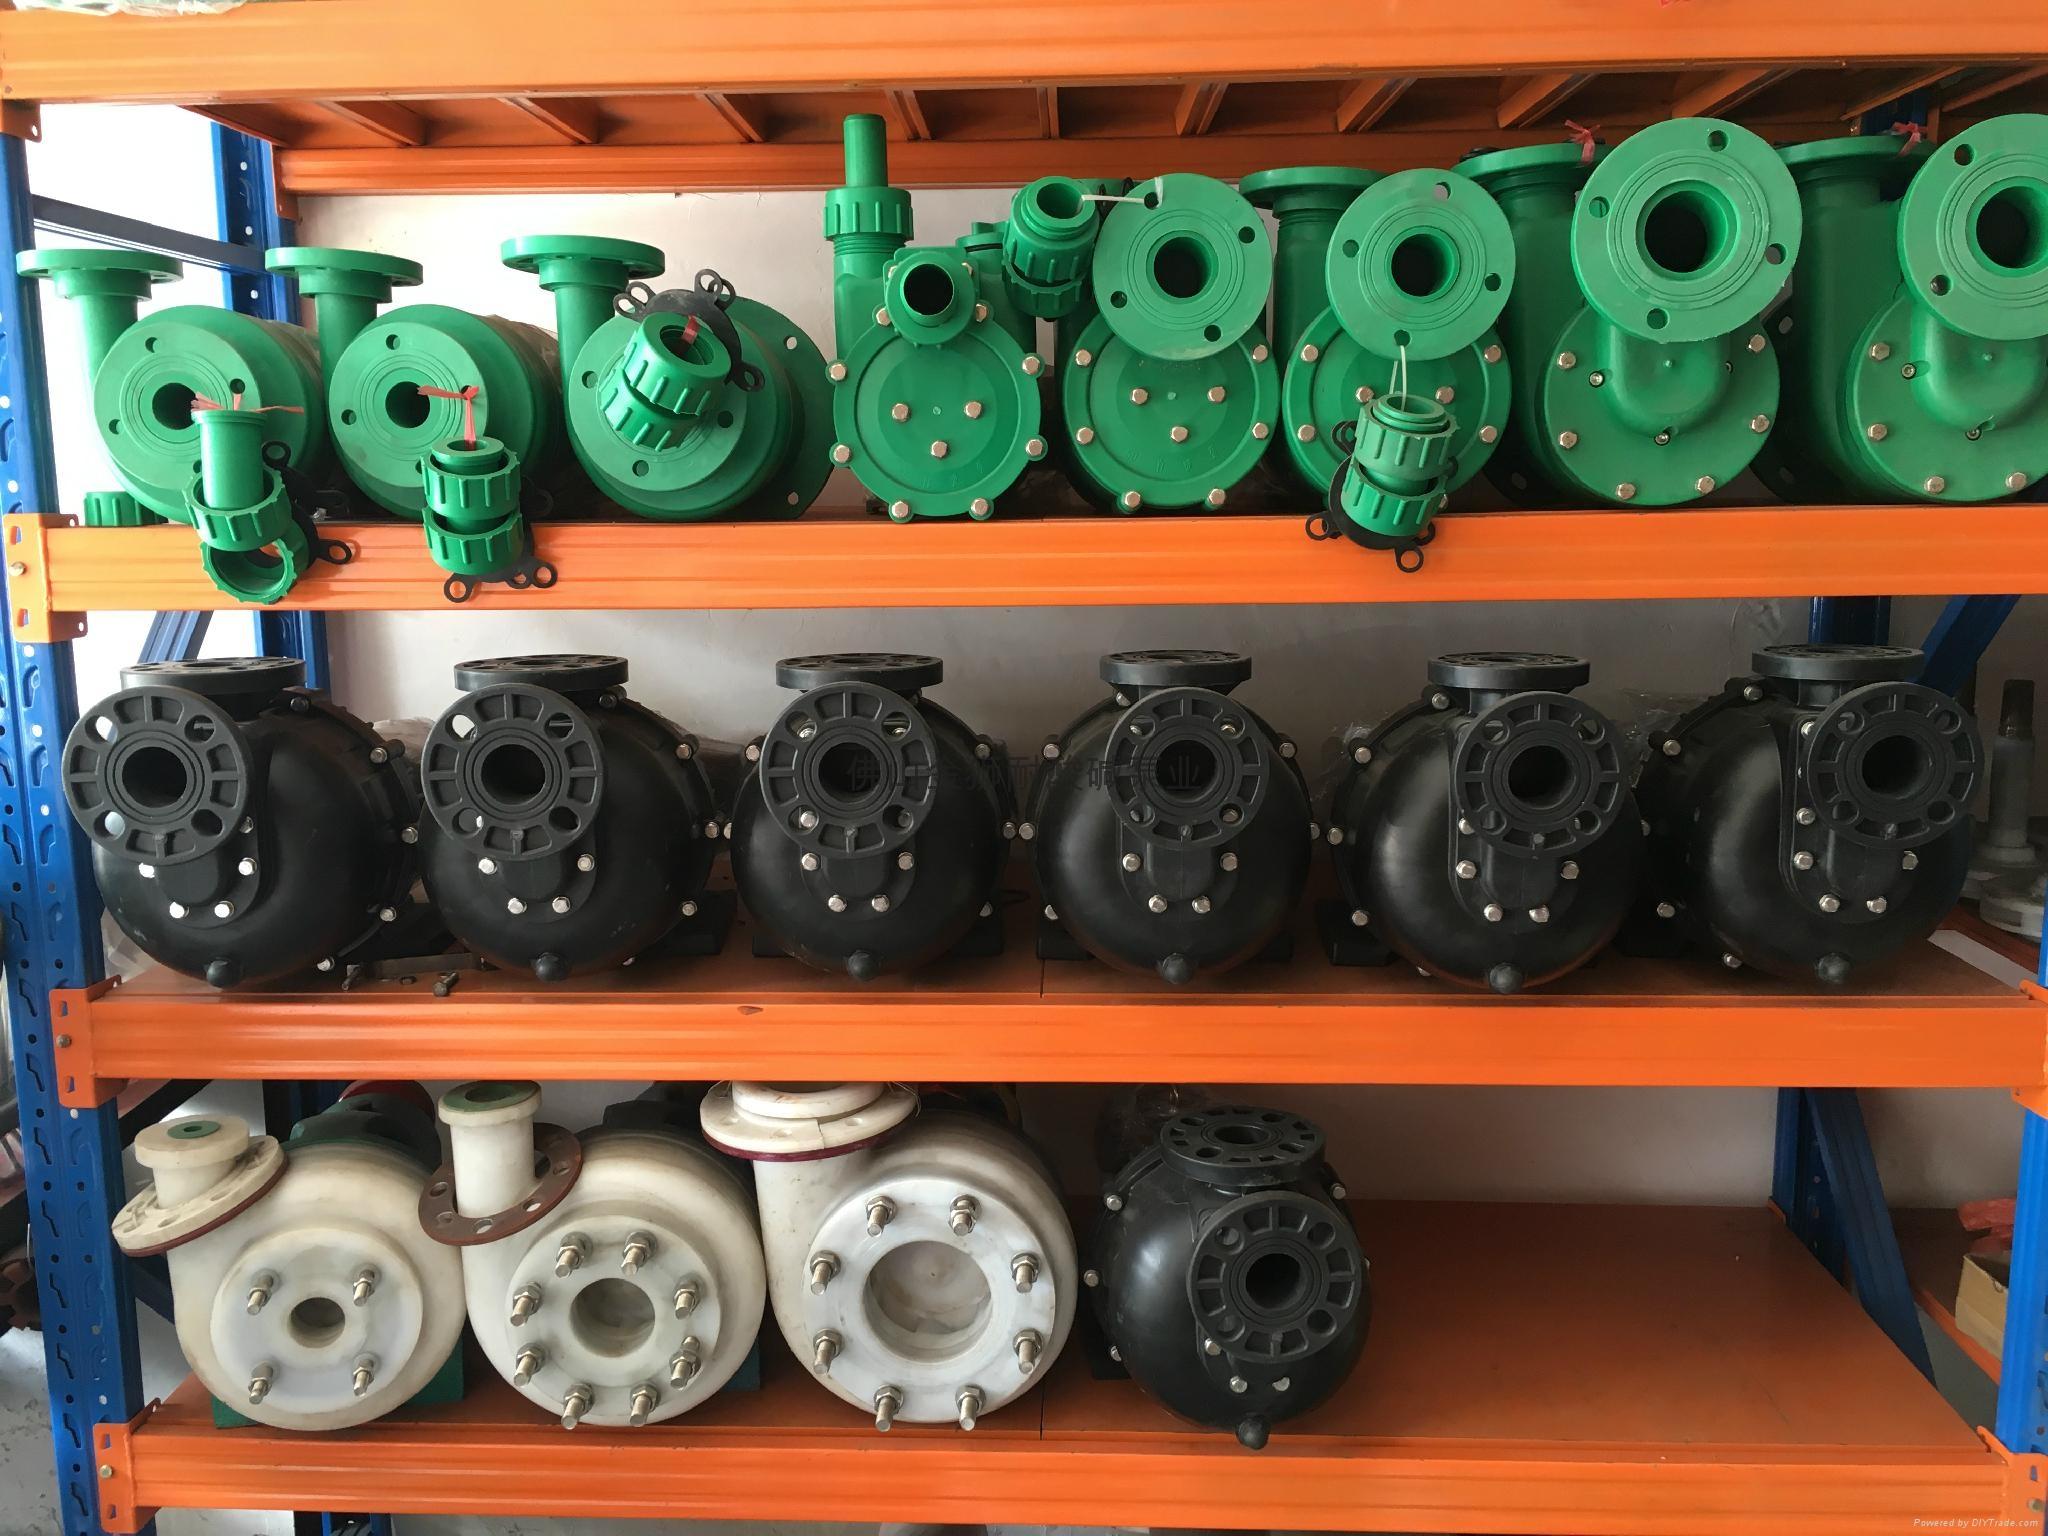 CD-40022H铁氟龙弹性轴封大头泵 3